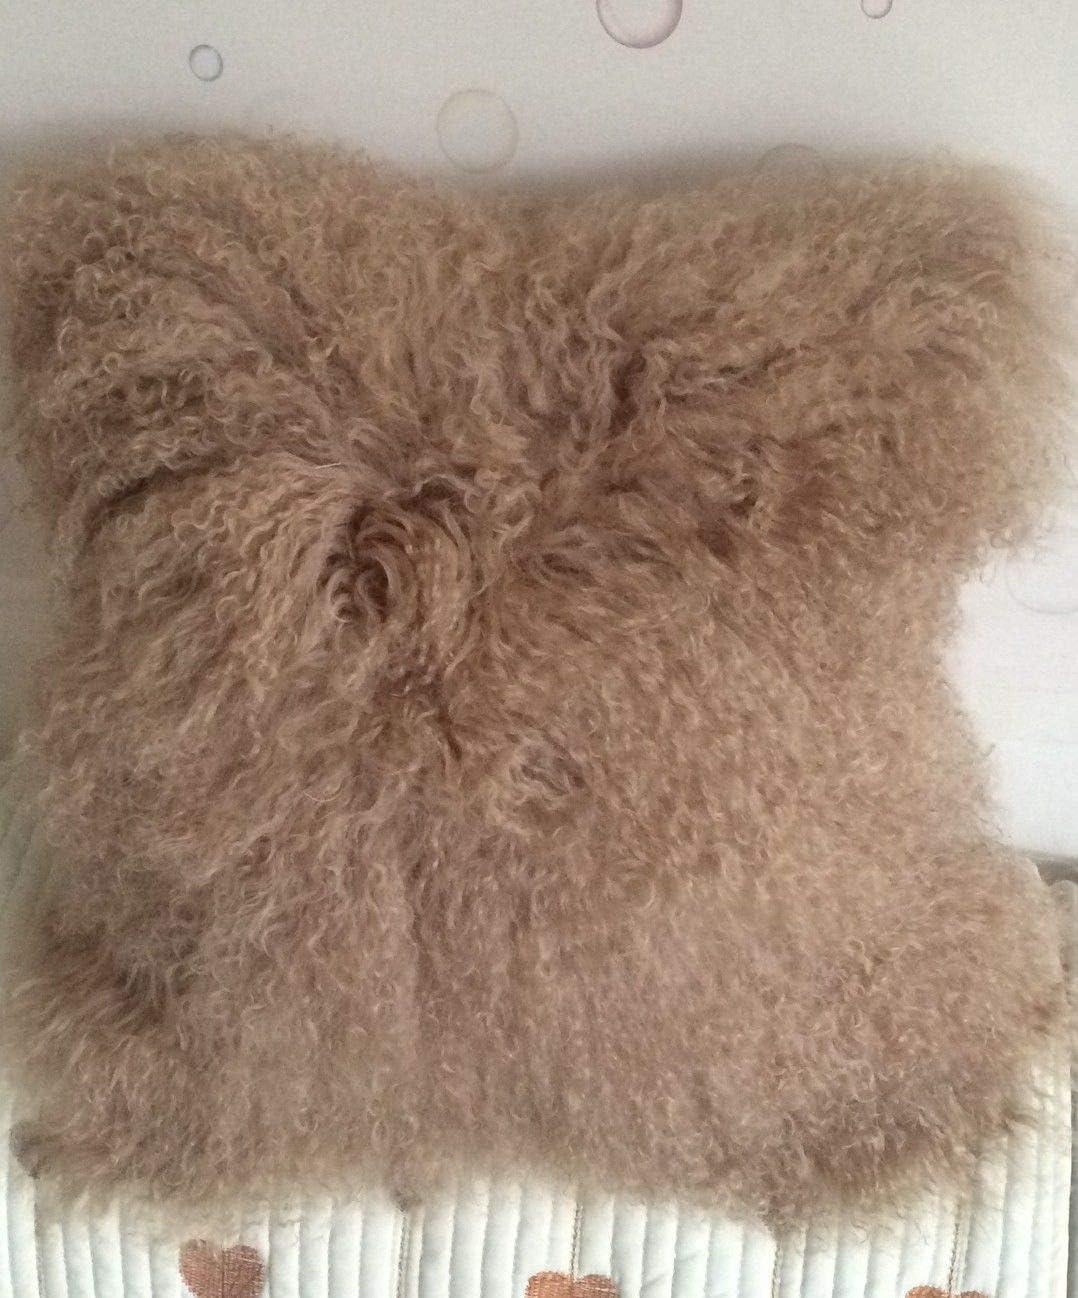 Seek4comfortable 100% Real Mongolian Lamb Sheepskin Wool Fur Throw Pillow Cover |Fur Decorative Cushion Cover Pillow Case for Living Room Bedroom, Khaki,16 x 16 in